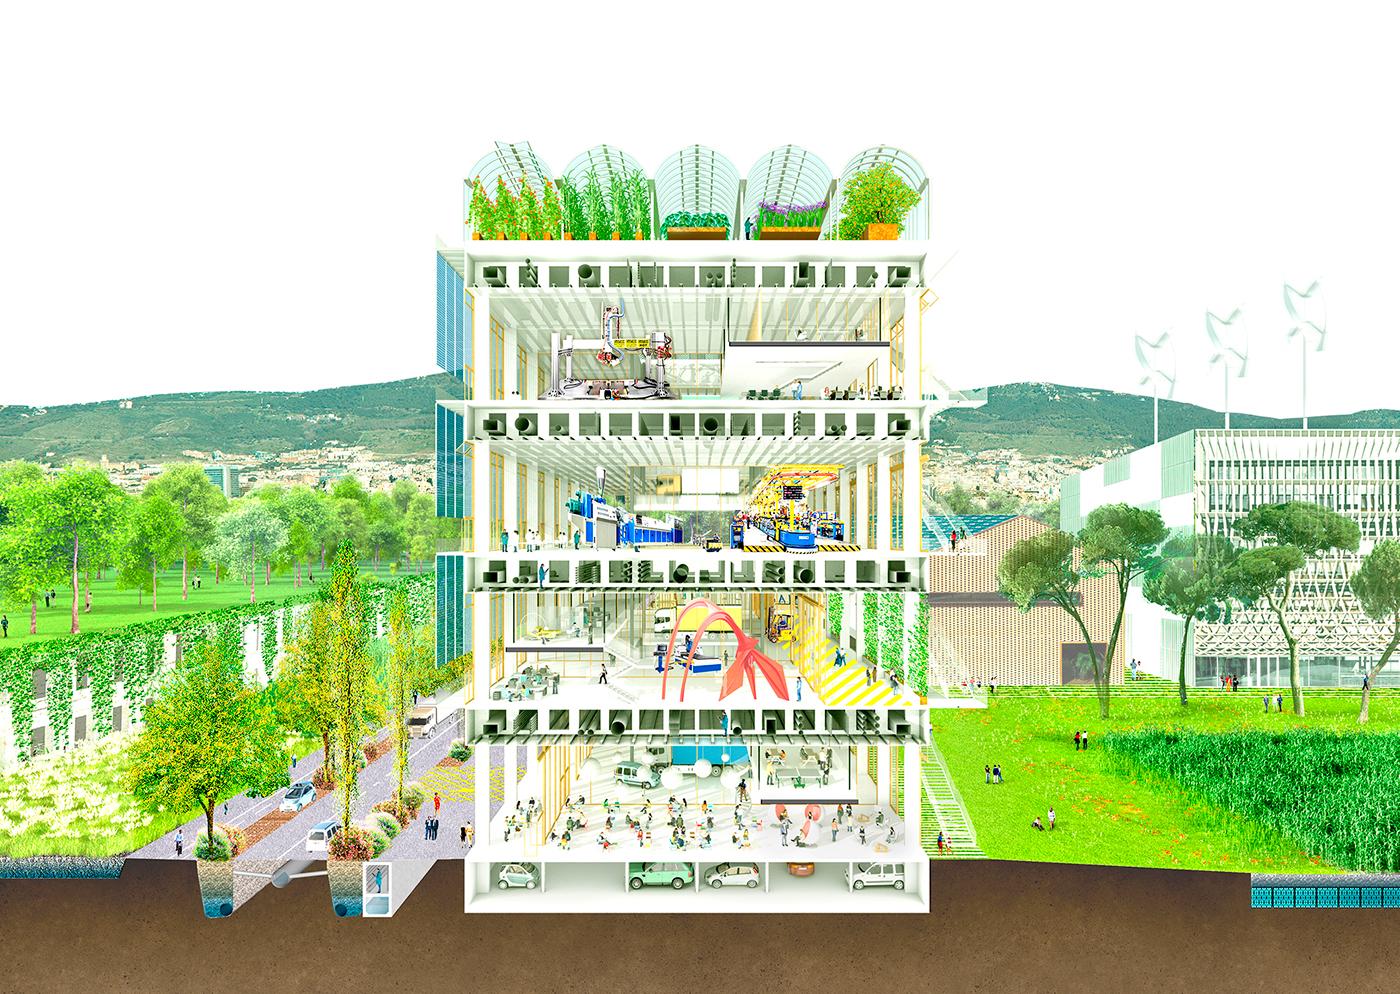 Torrent estadella eco industrial park on behance for Fabrik landscape architects